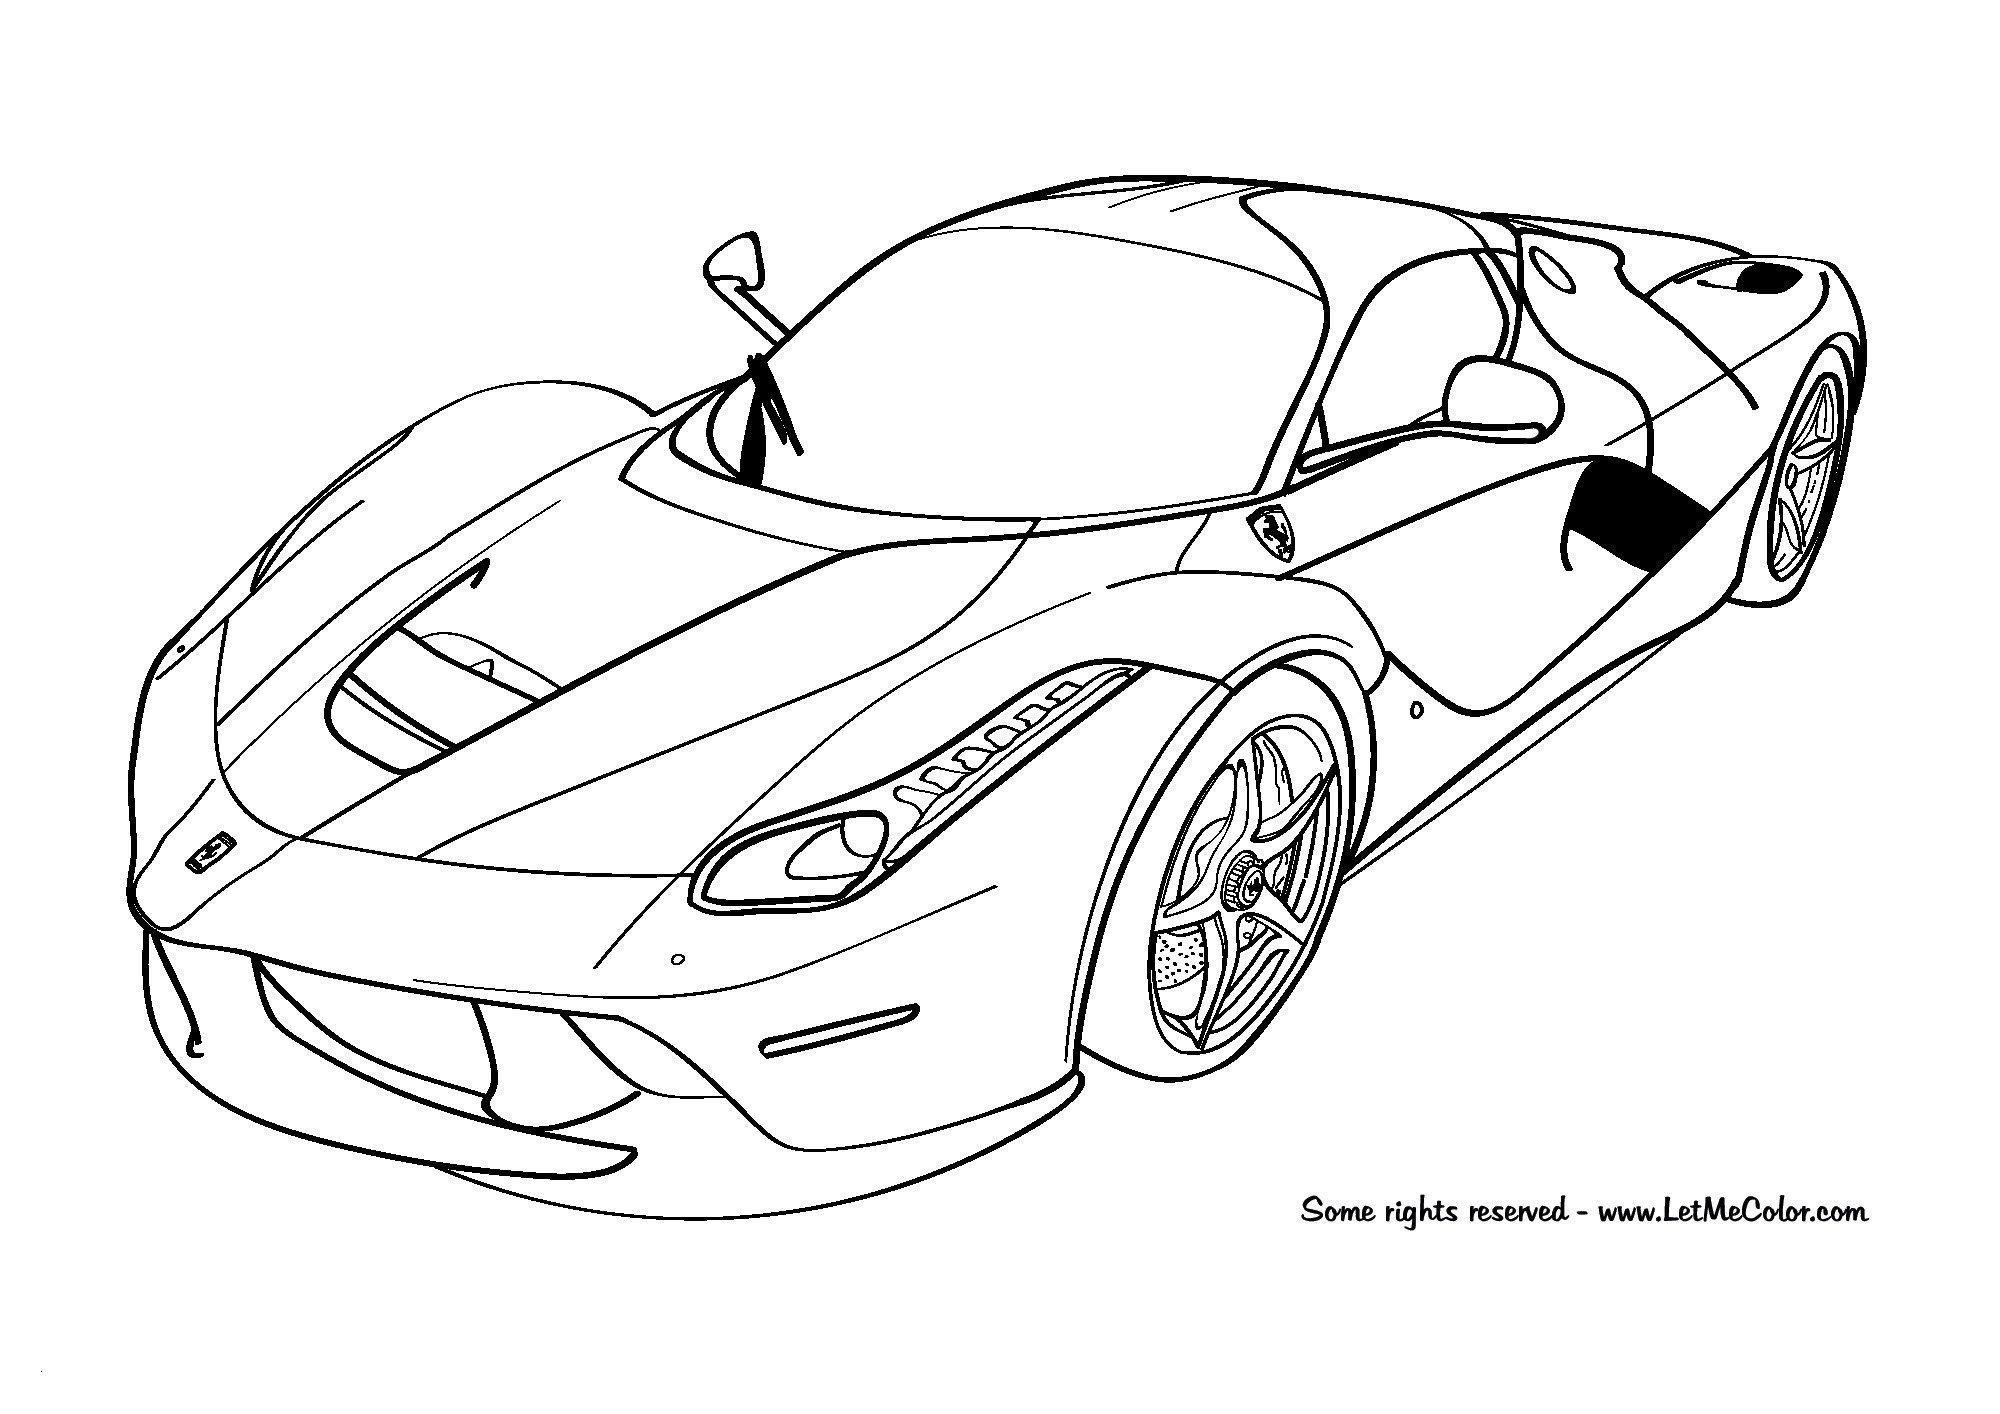 Bildergebnis Fur Malbild Auto Autos Malen Ausmalen Ferrari